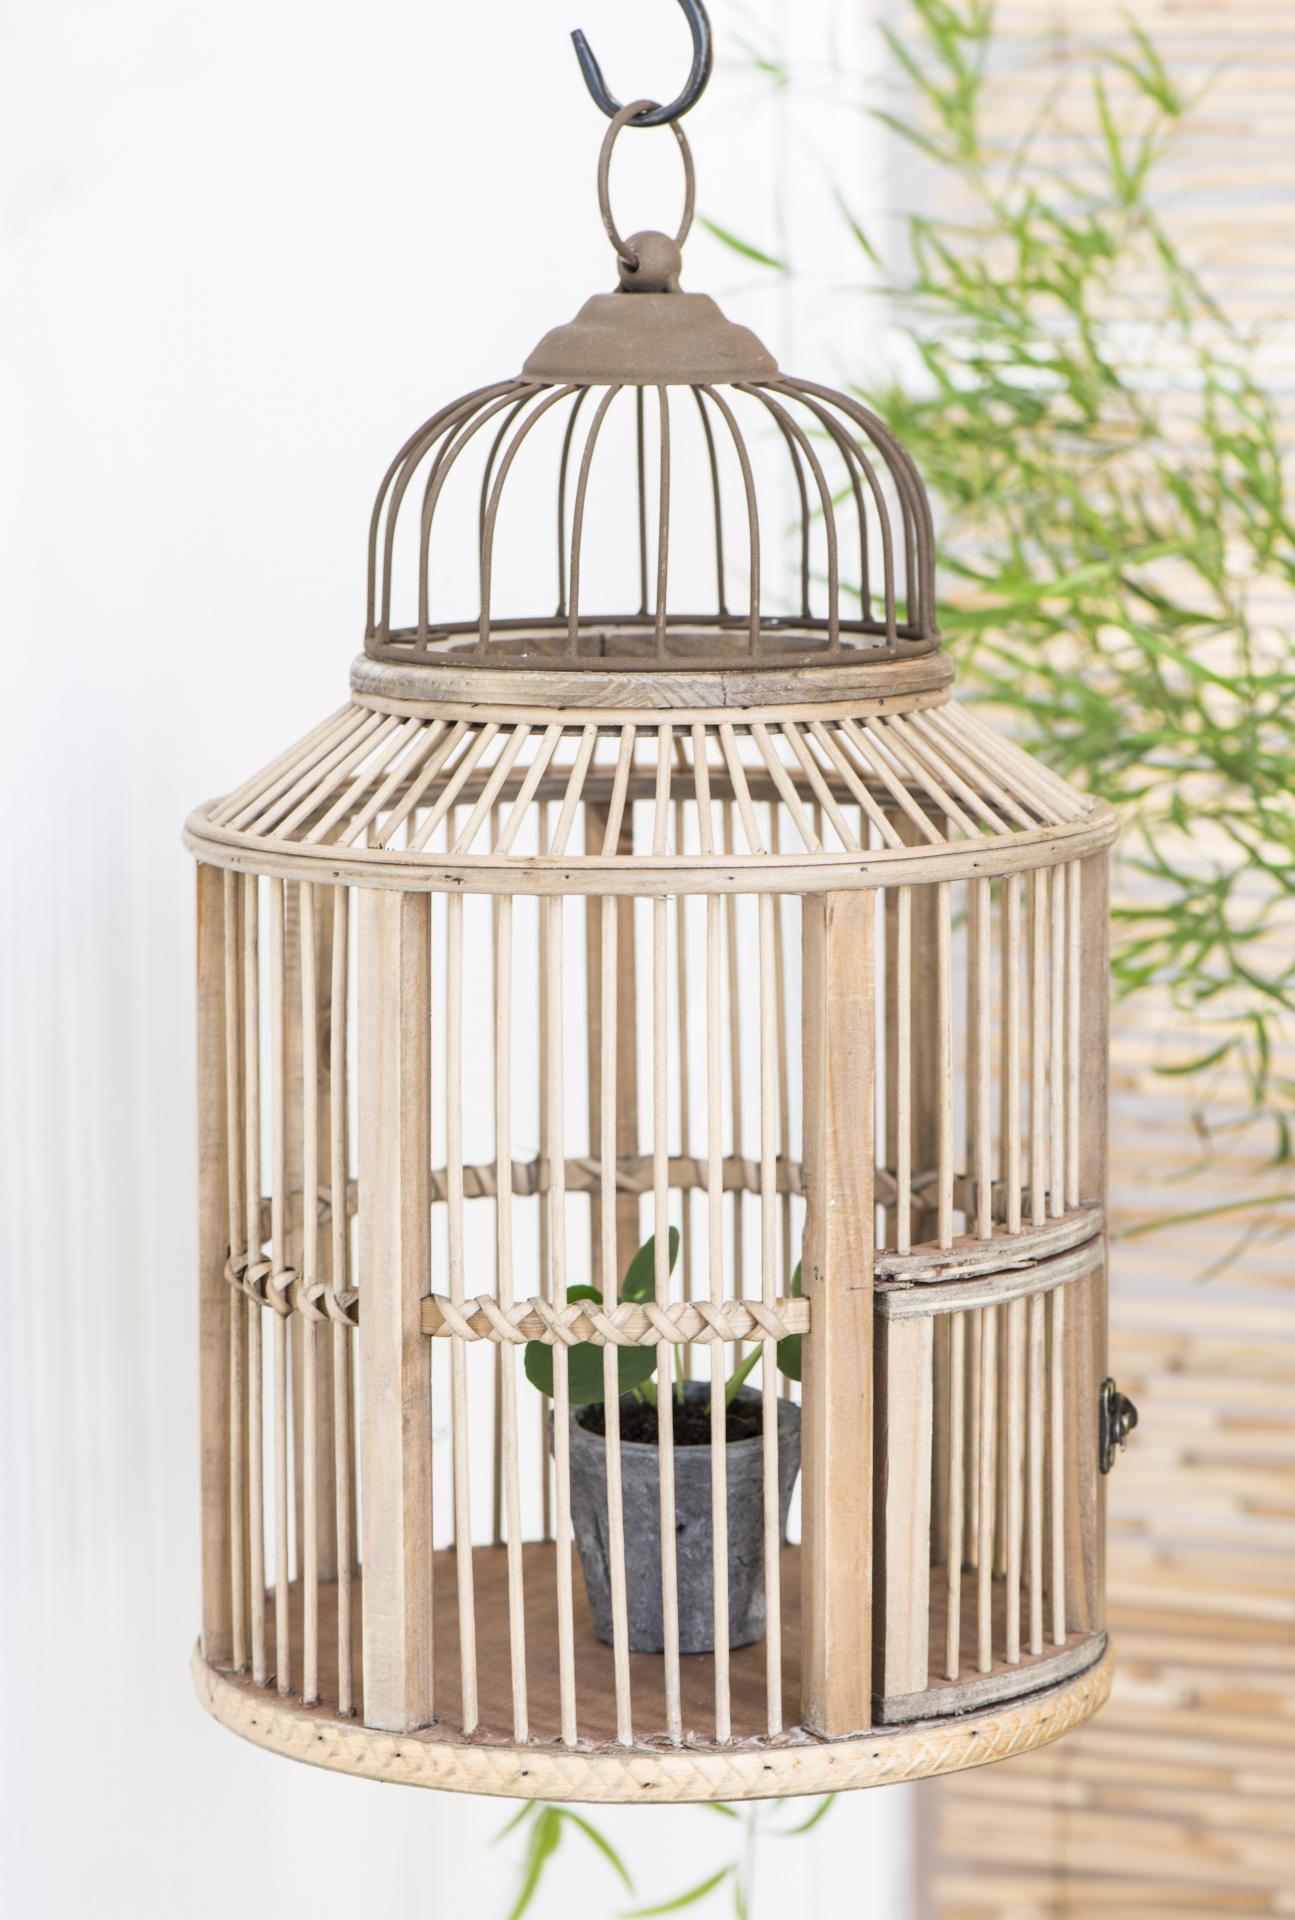 IB LAURSEN Dekorativní ptačí klec ze dřeva, přírodní barva, dřevo